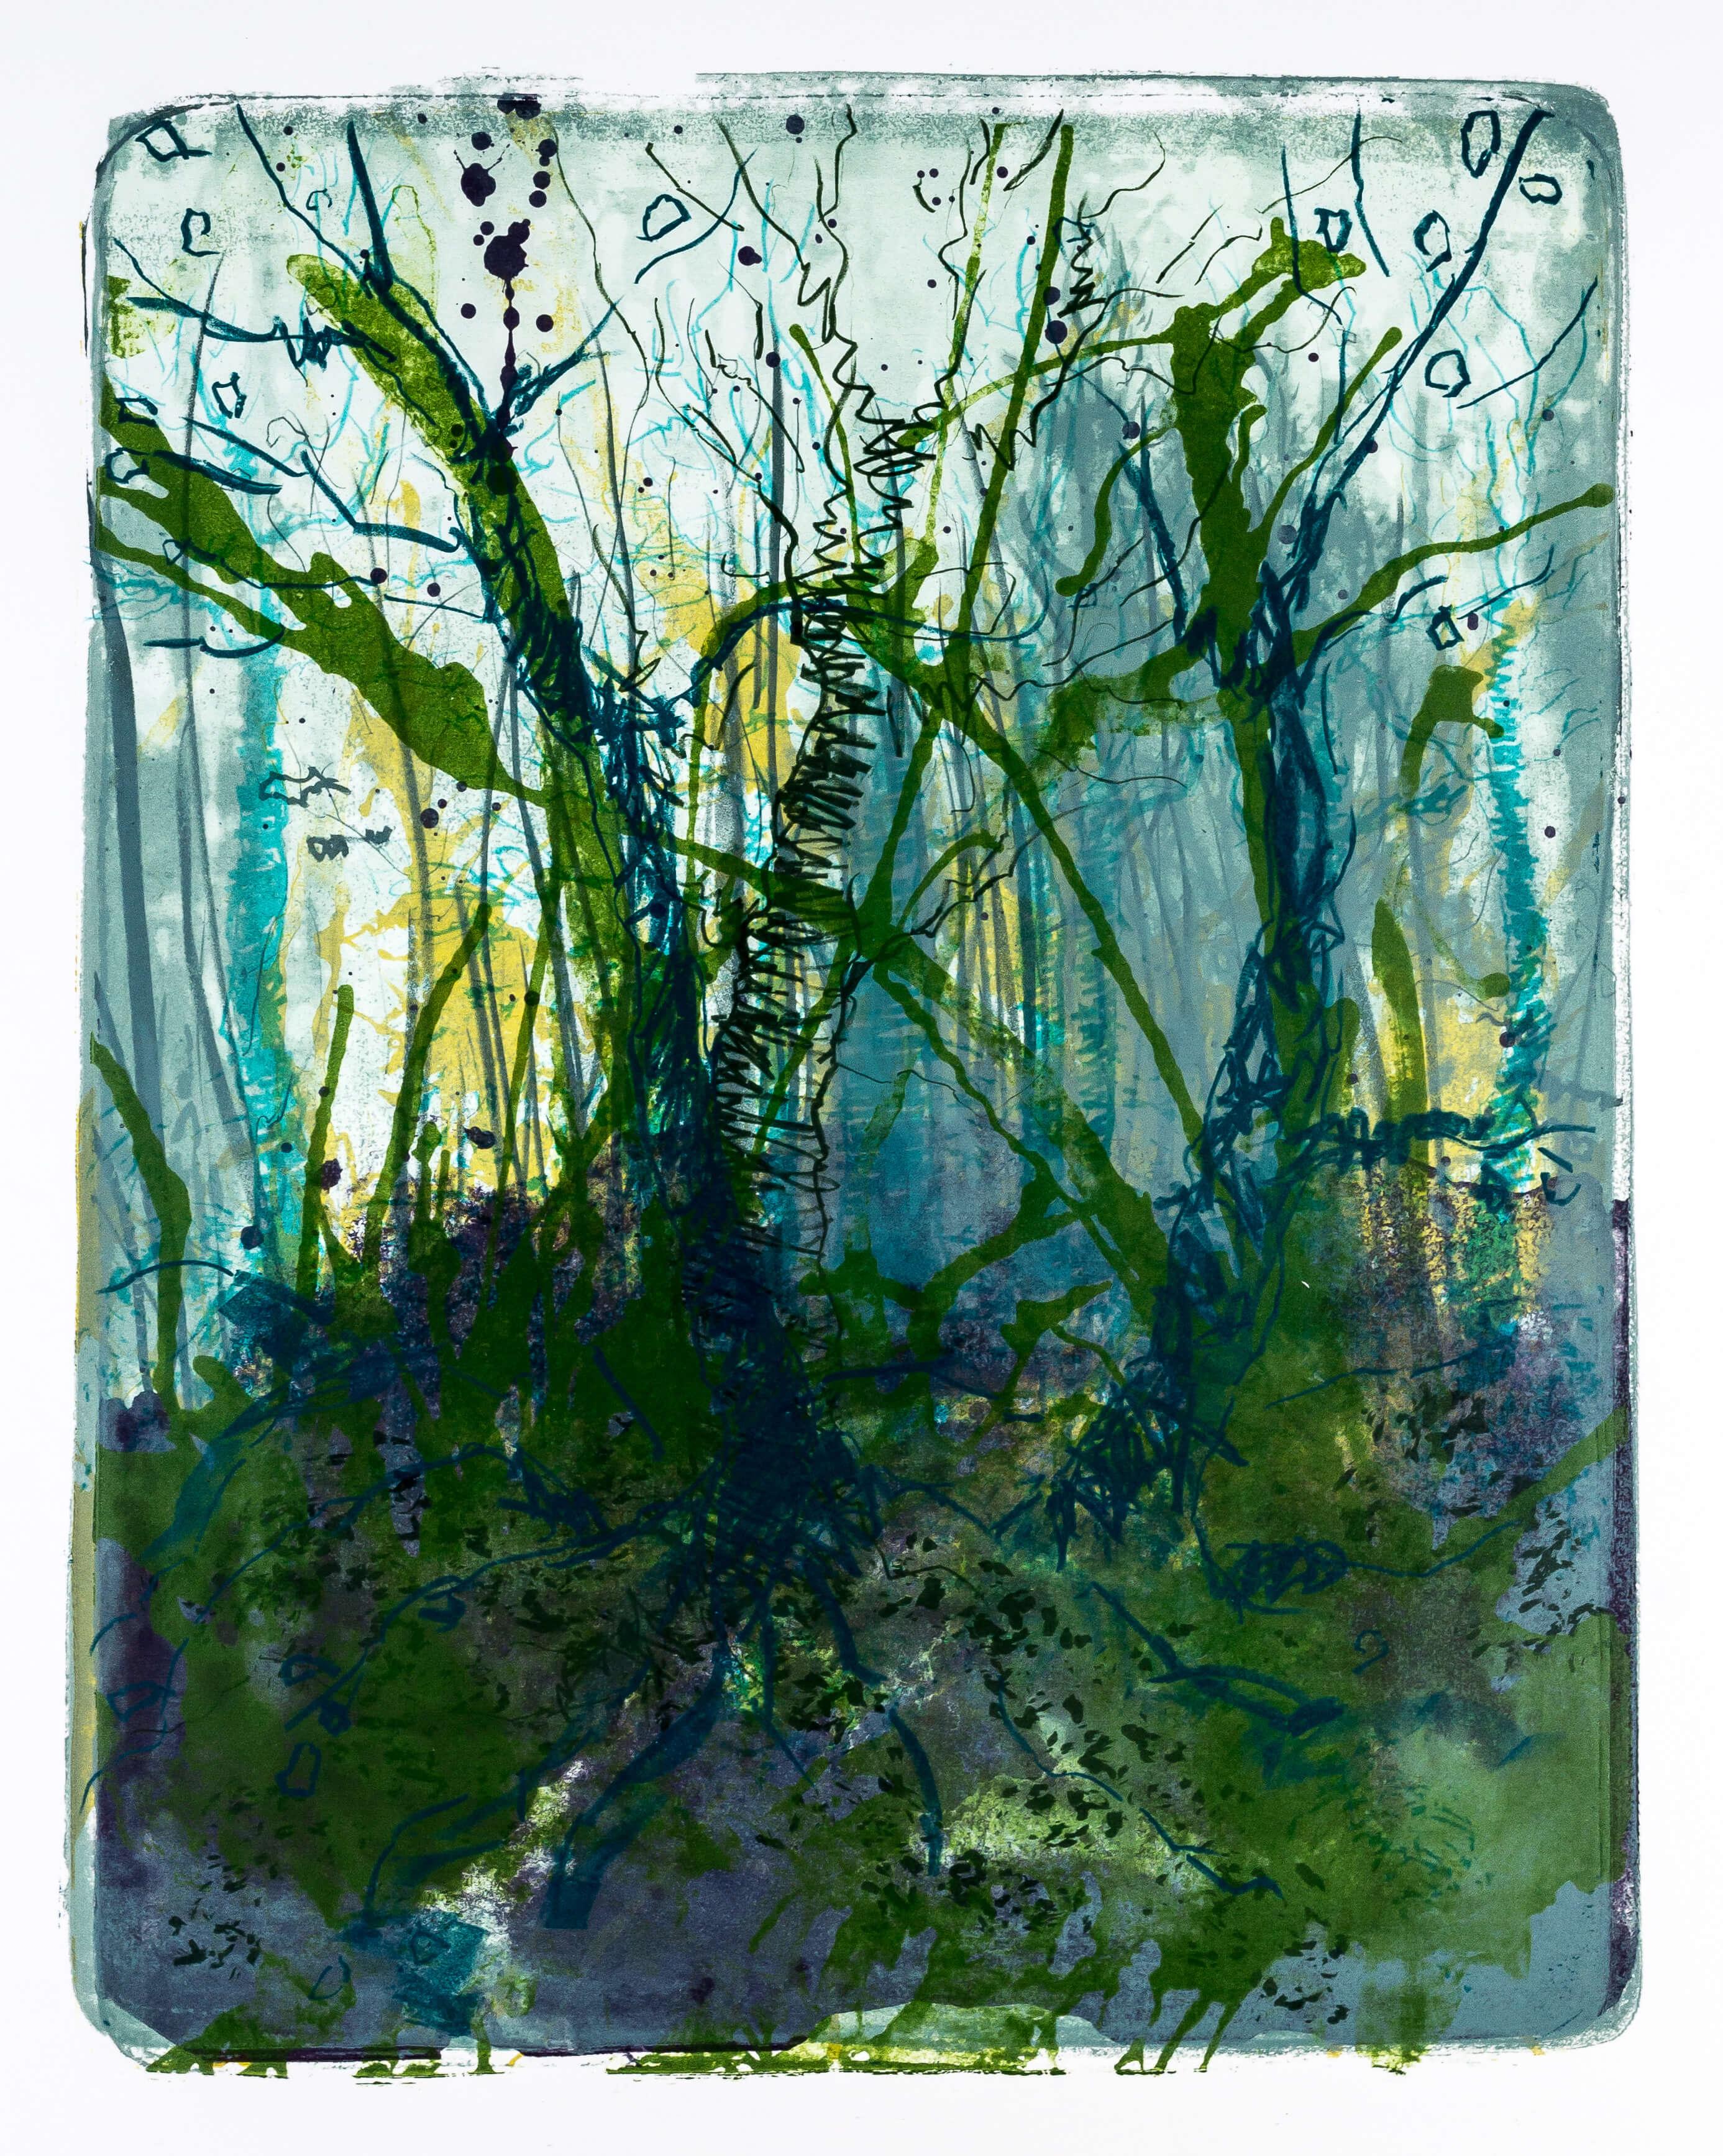 Katharina Albers, Wald X-XV, 2015, Farblithographie, Unikat, 50×40 cm